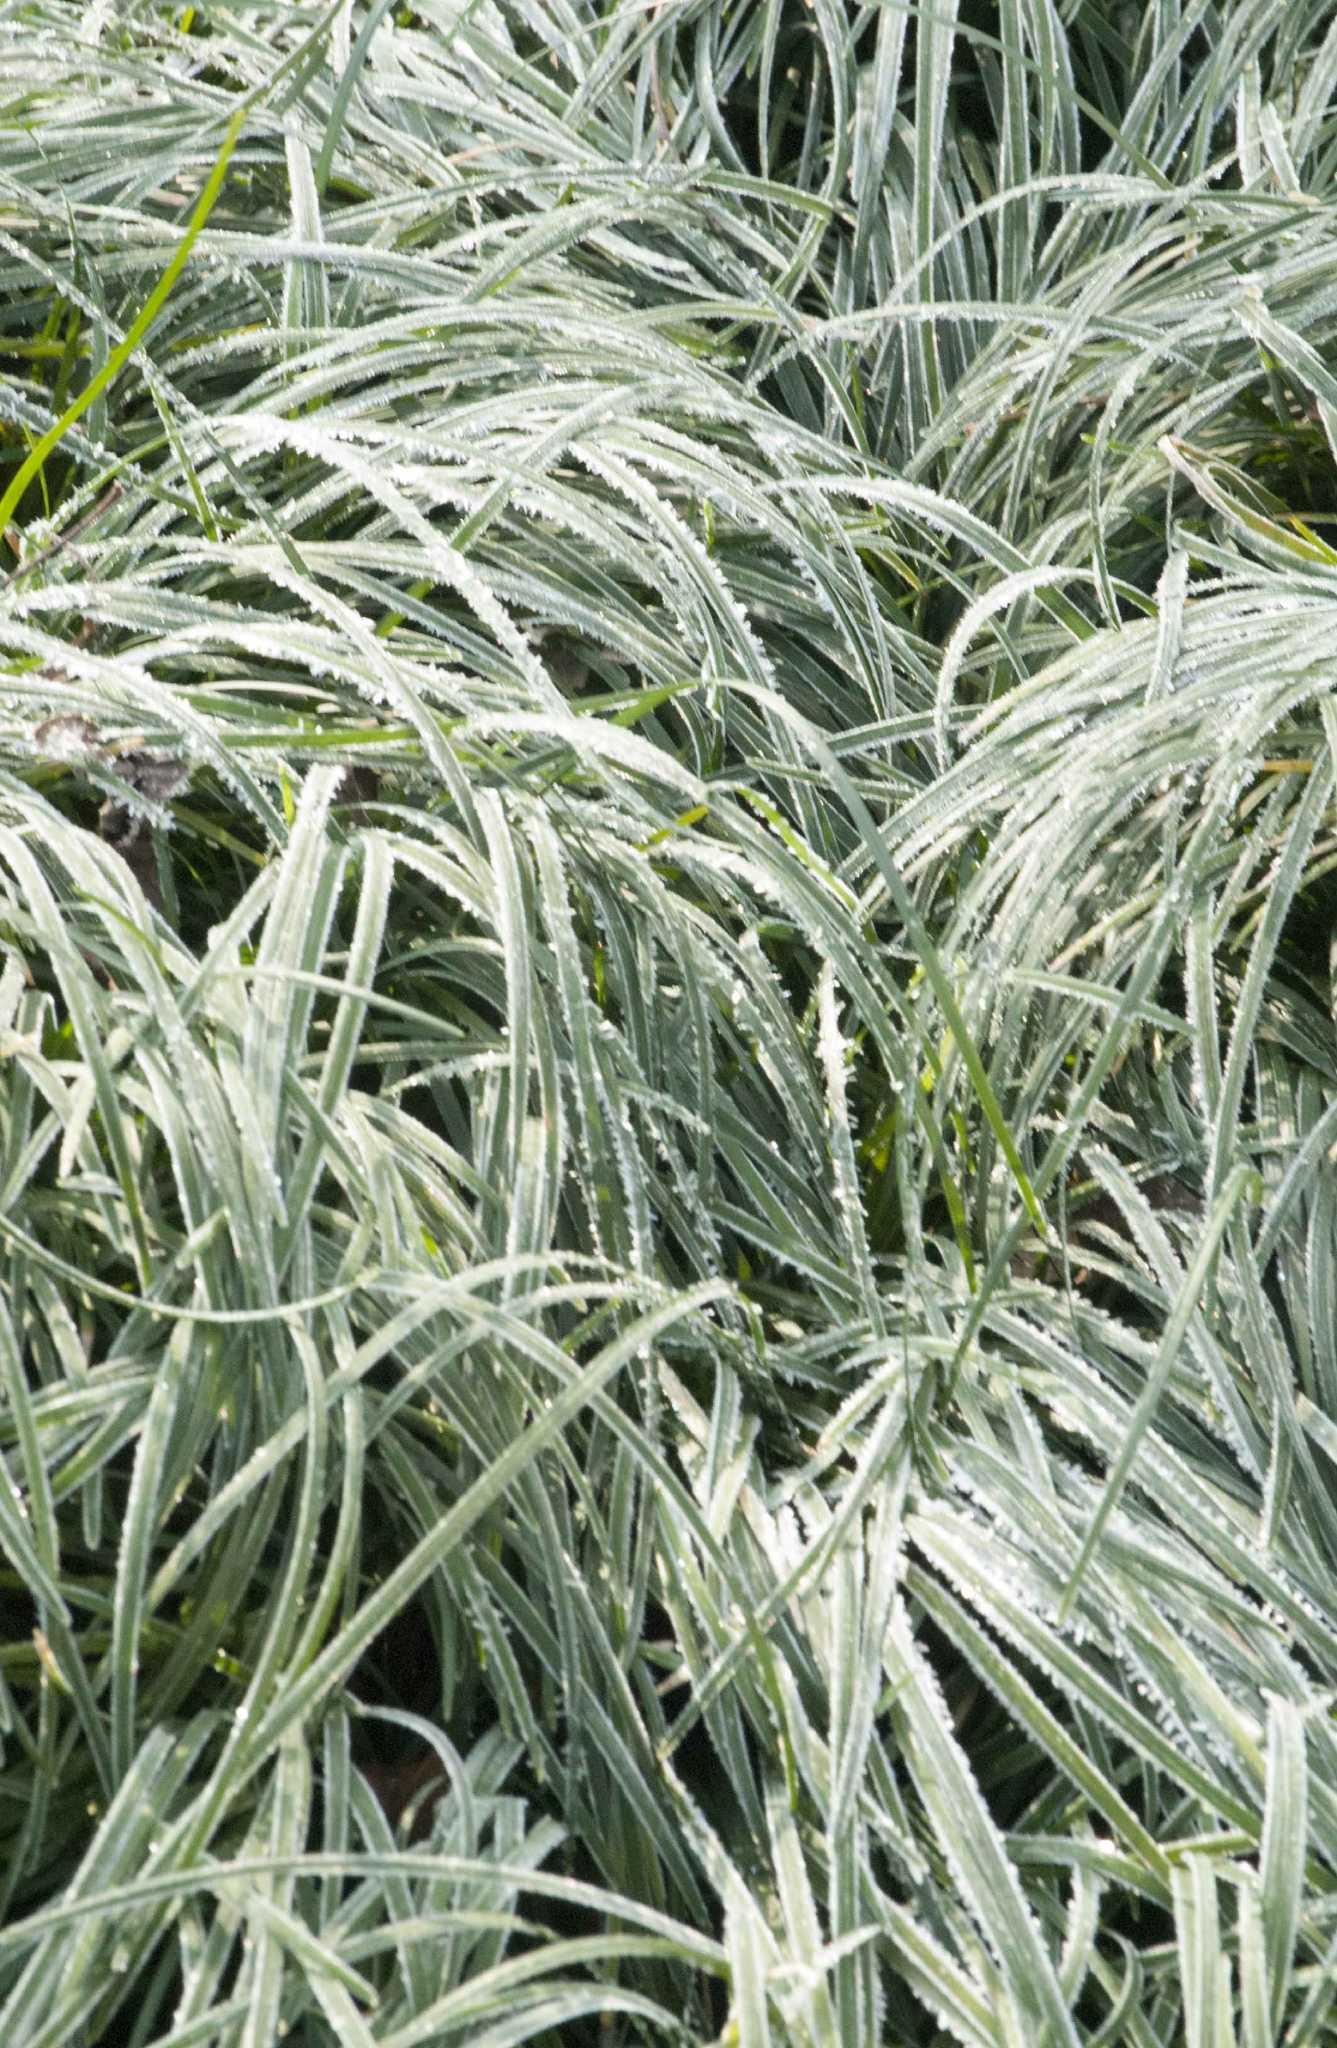 Neil Sperry: Trim Asian jasmine, mondo grass with an eye on looks - San  Antonio Express-News